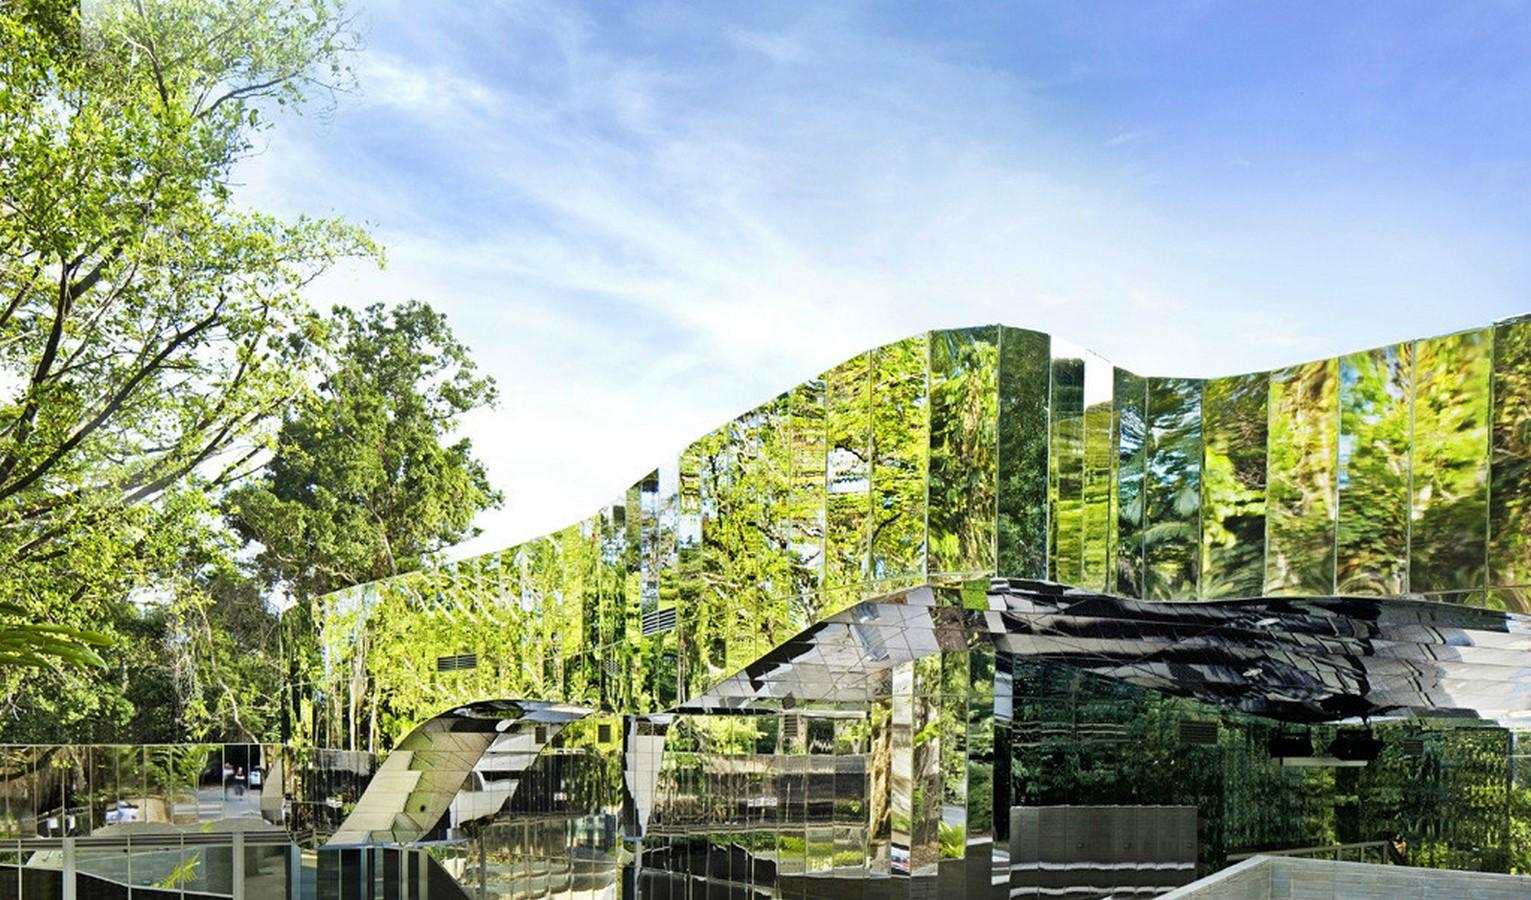 Cairns Botanic Gardens Visitors Centre - Sheet1